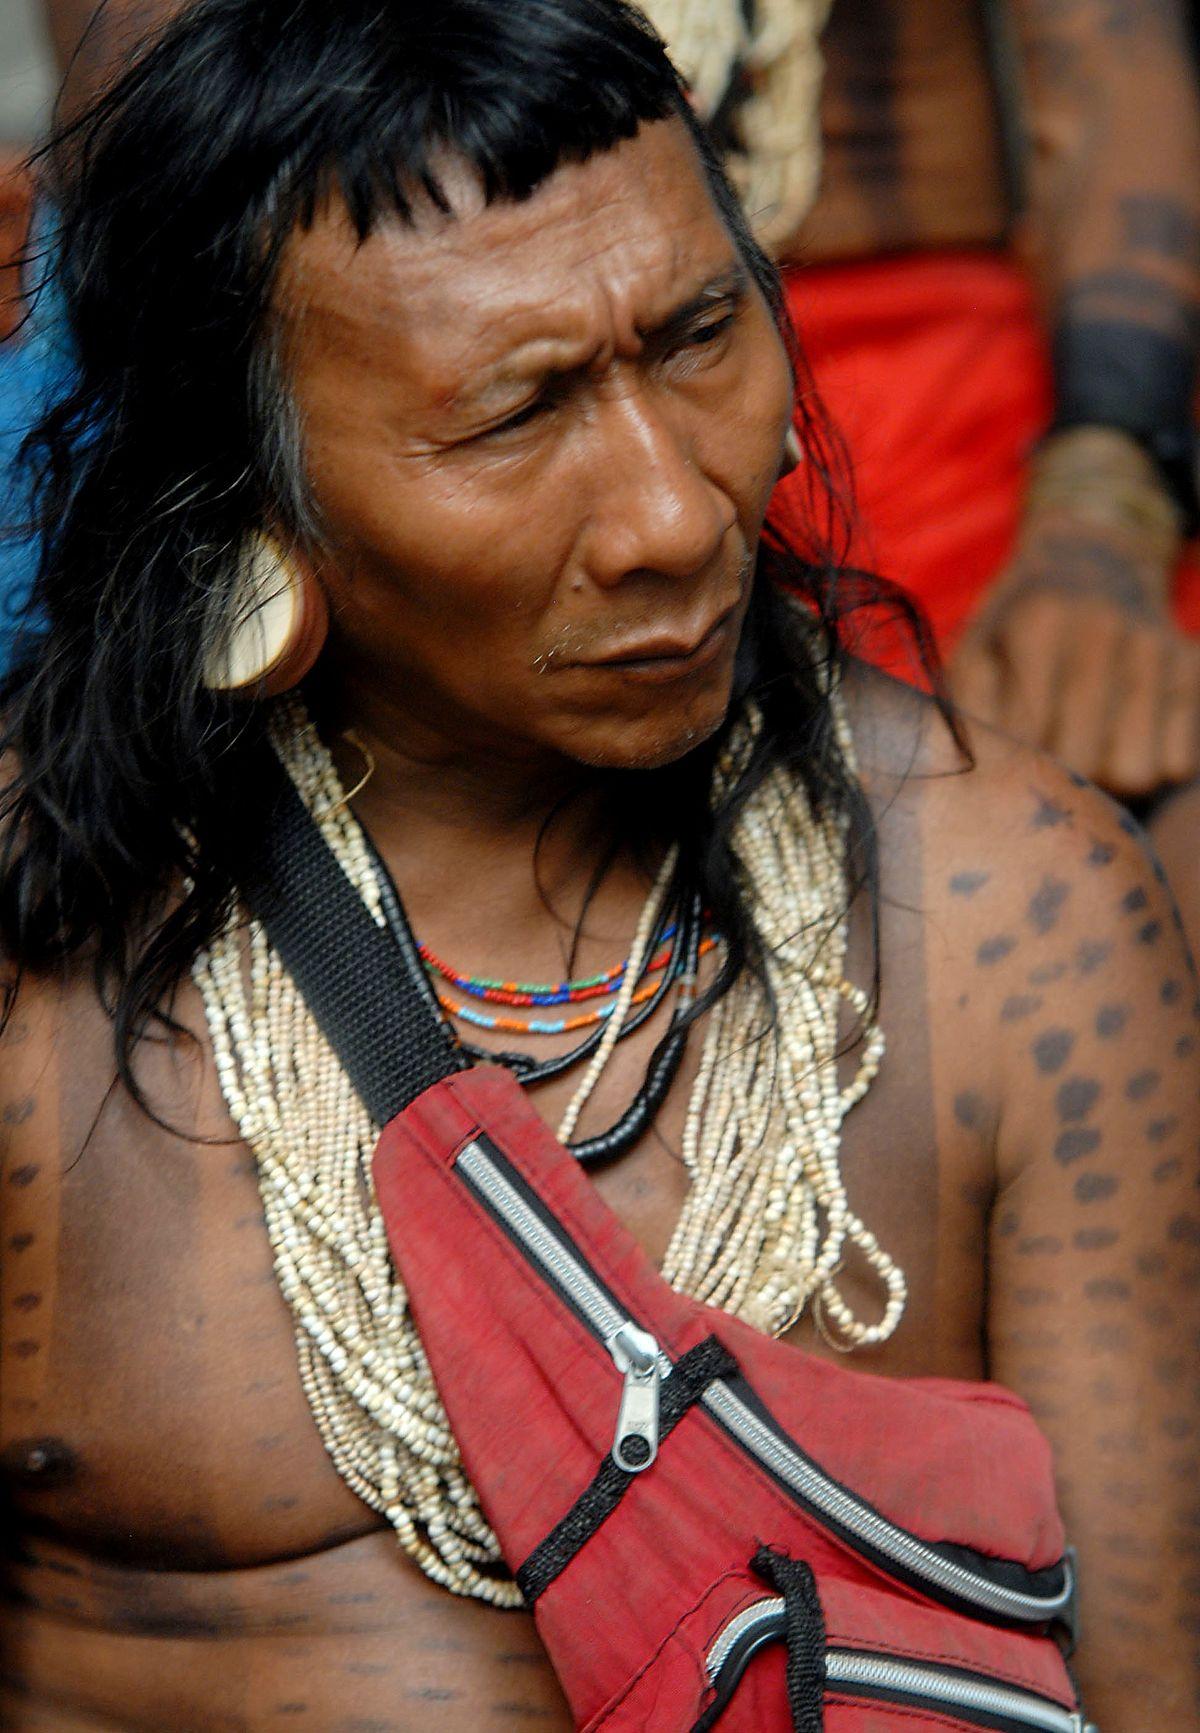 Rikbaktsa peuple  Wikipdia